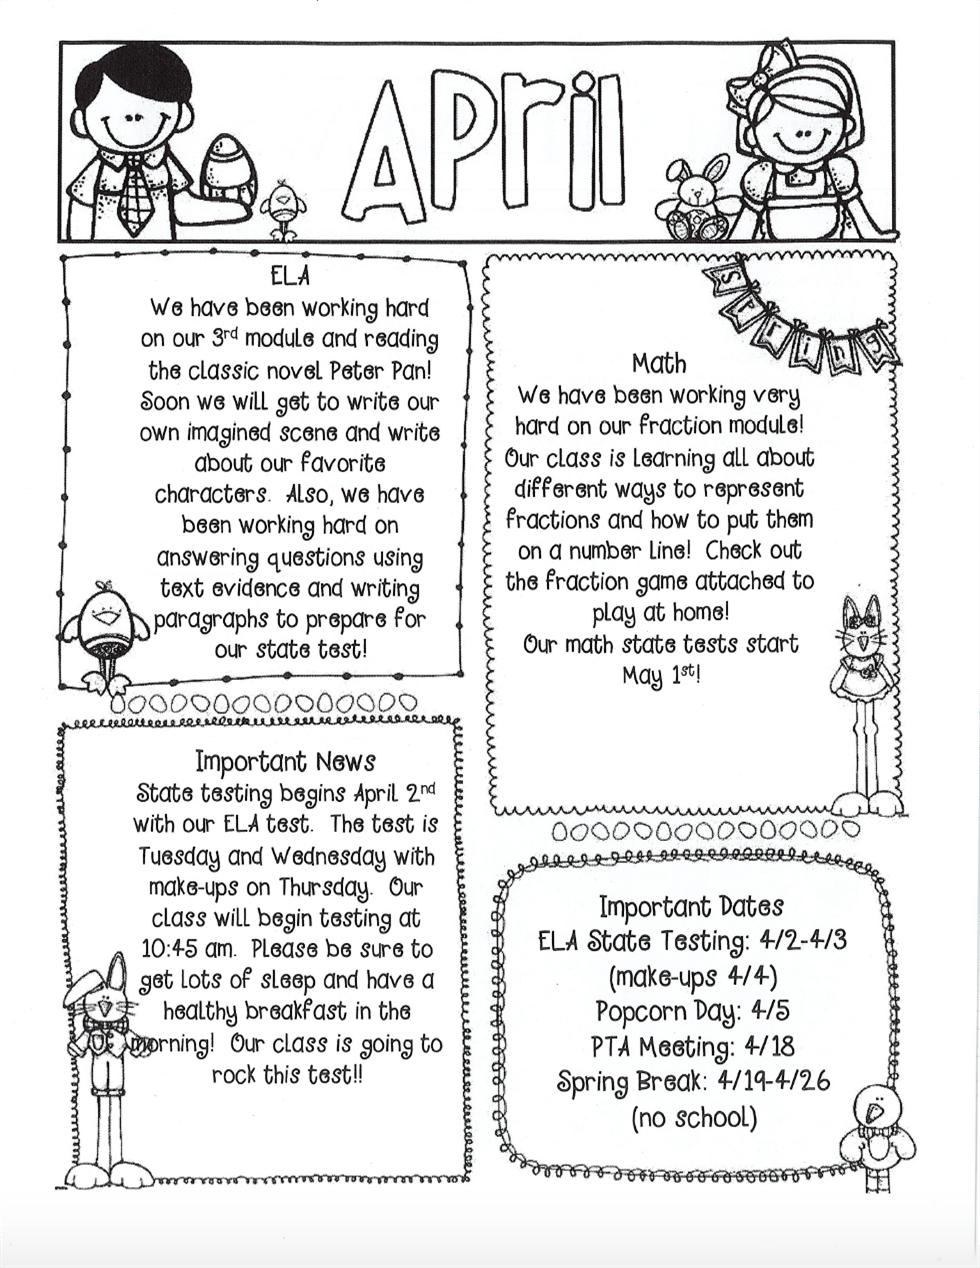 Rinaldo, Kali / April Newsletter